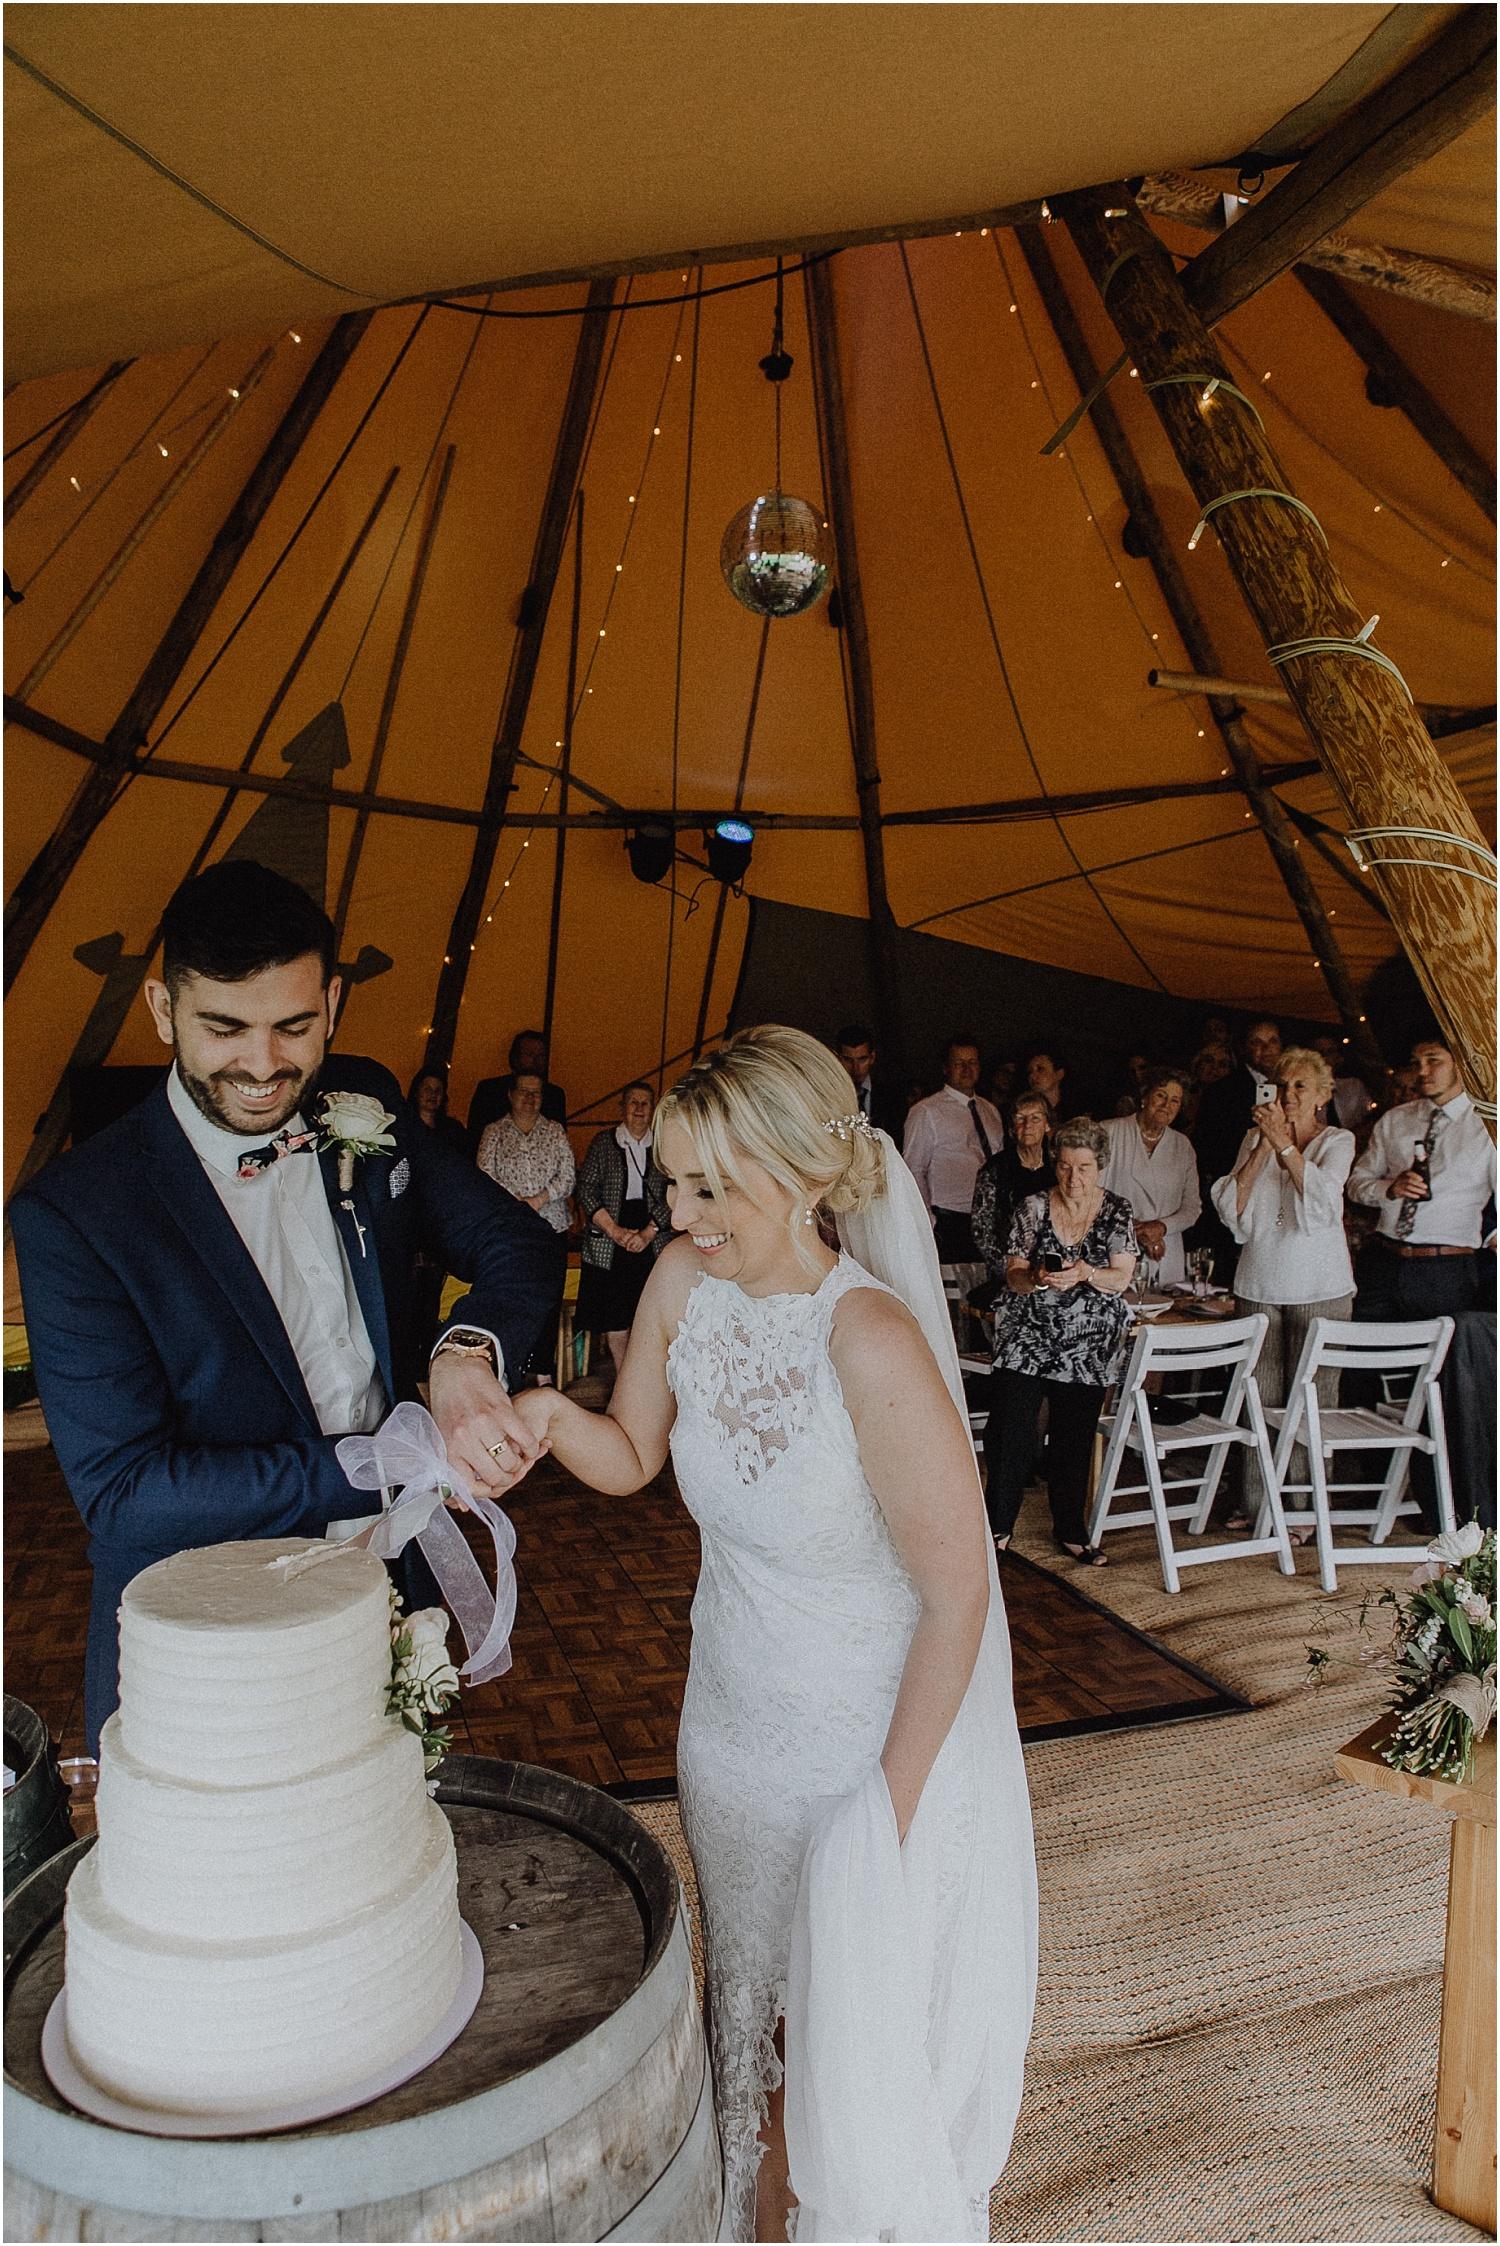 Nicolle and Damien's tipi wedding at the Flinders Yacht Club on the Mornington Peninsula._0162.jpg